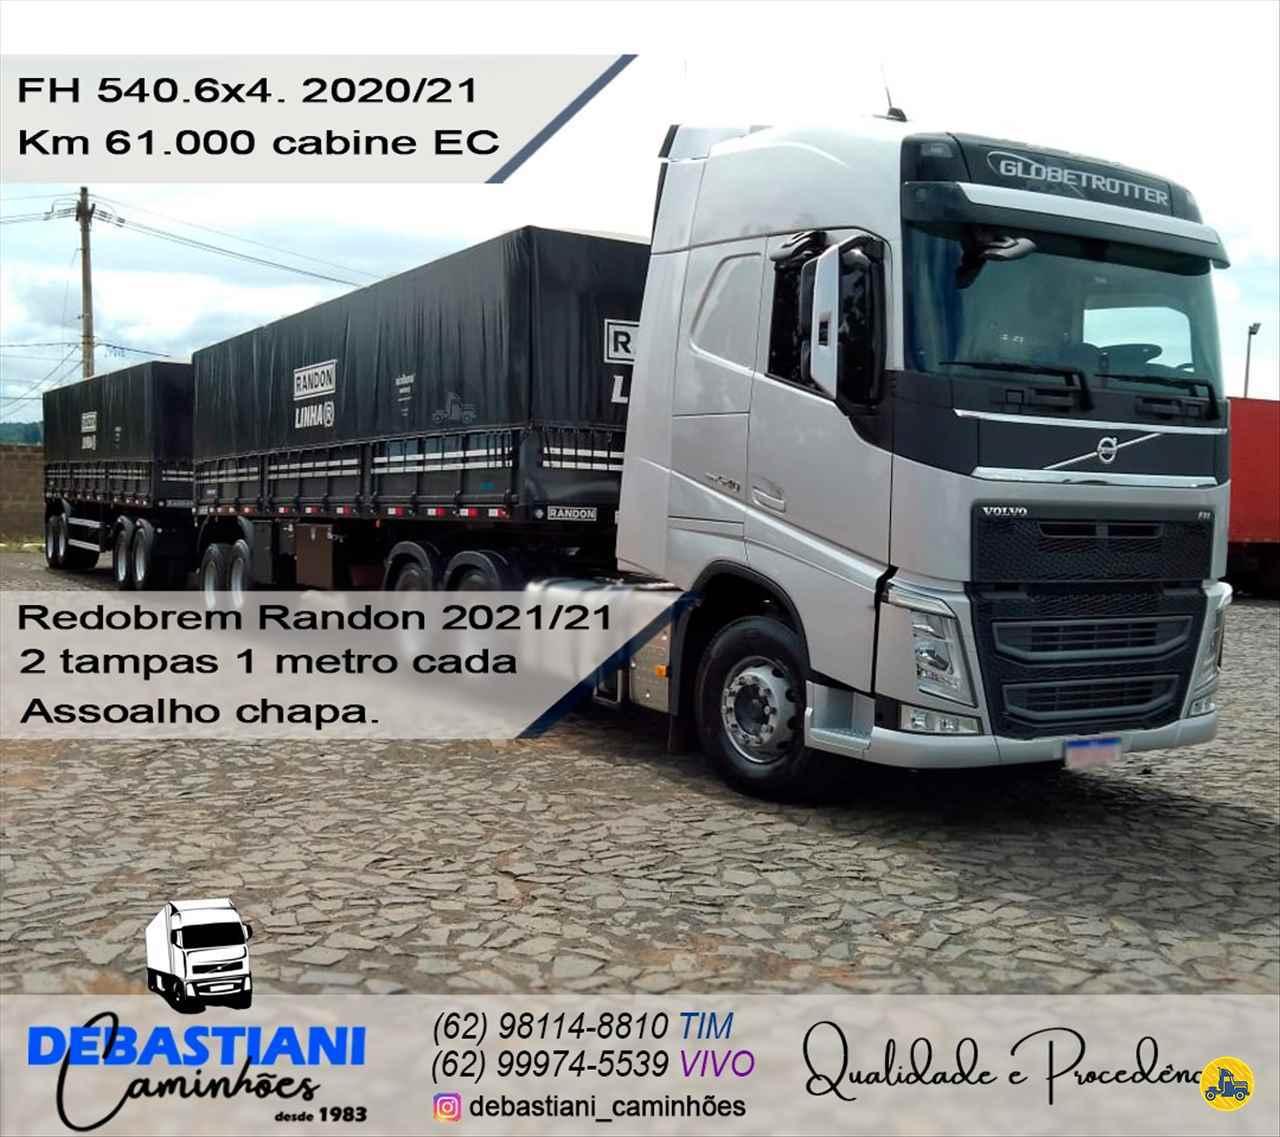 VOLVO FH 540 de Debastiani Caminhões - ANAPOLIS/GO